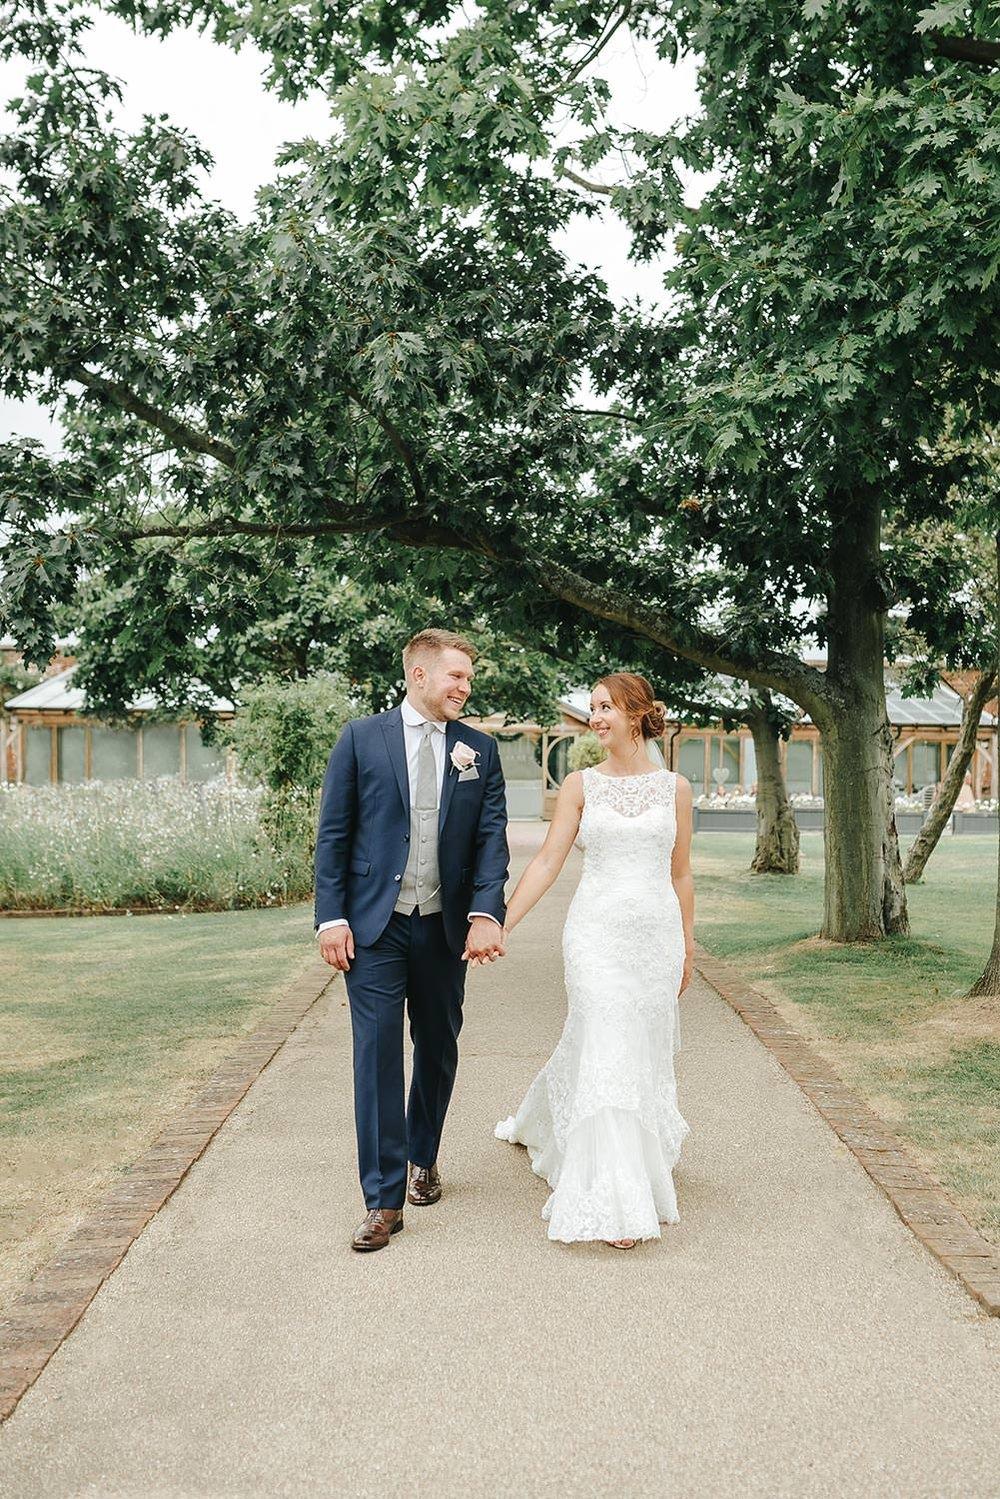 essex-wedding-photographer-gaynes-park-photographer-92.jpg